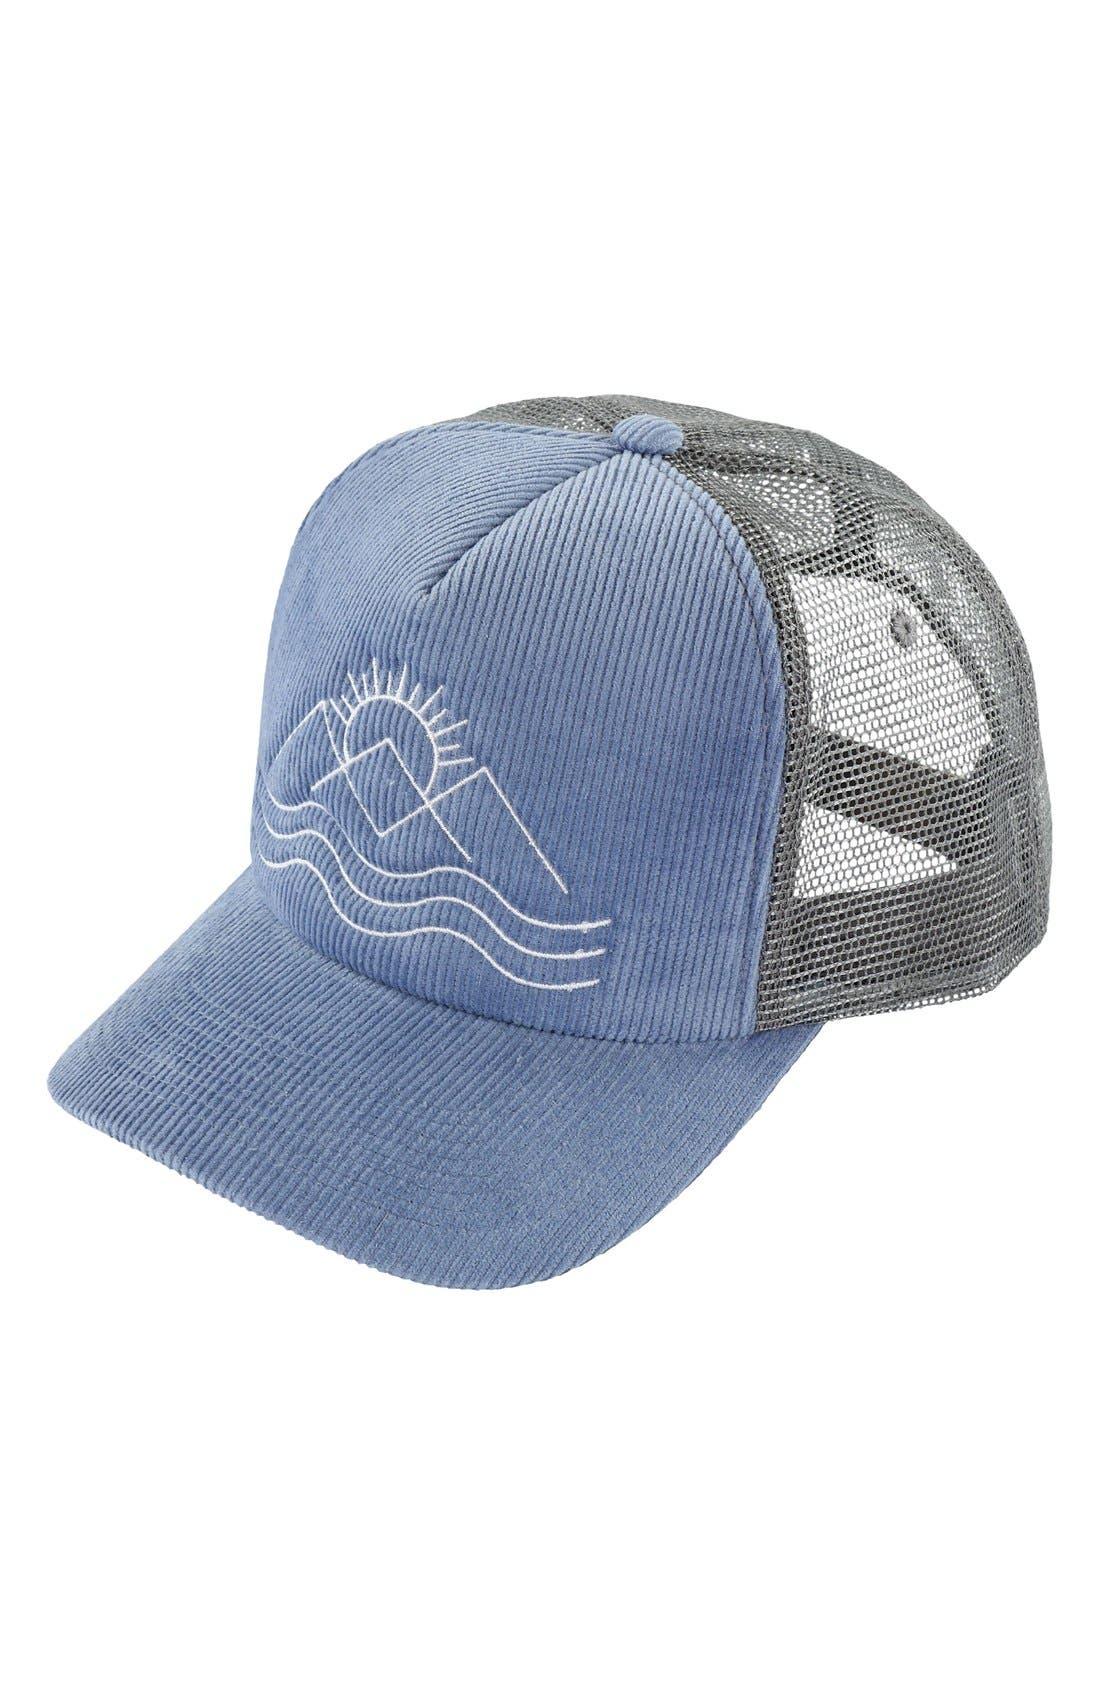 Main Image - O'Neill Outlook Corduroy Trucker Hat